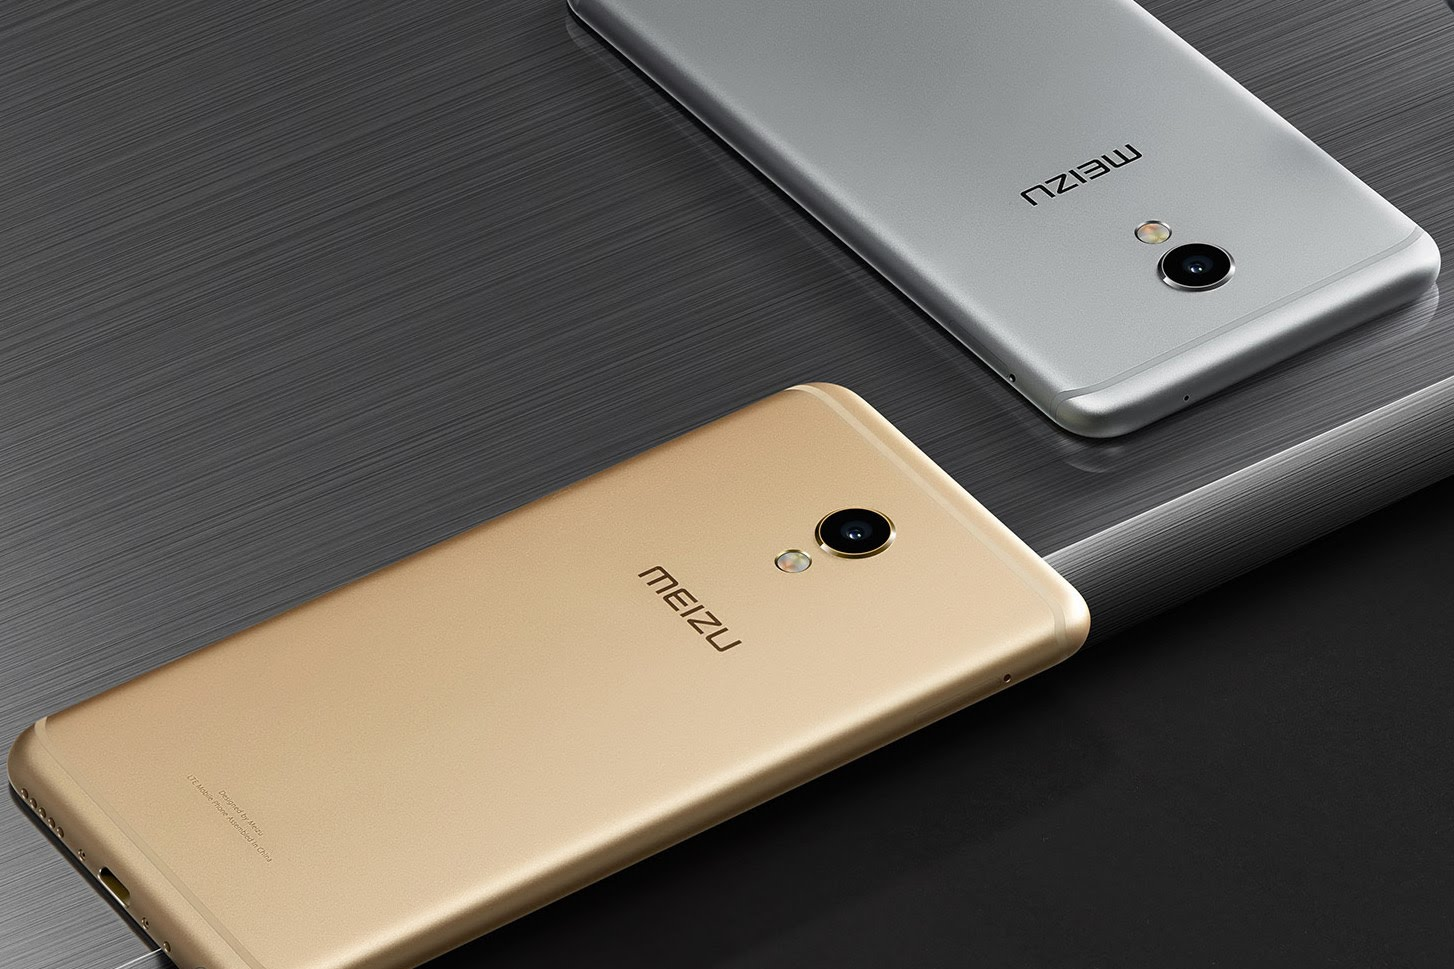 Meizu MX6-First Phone With Sony IMX 386 Camera - TechsBooks